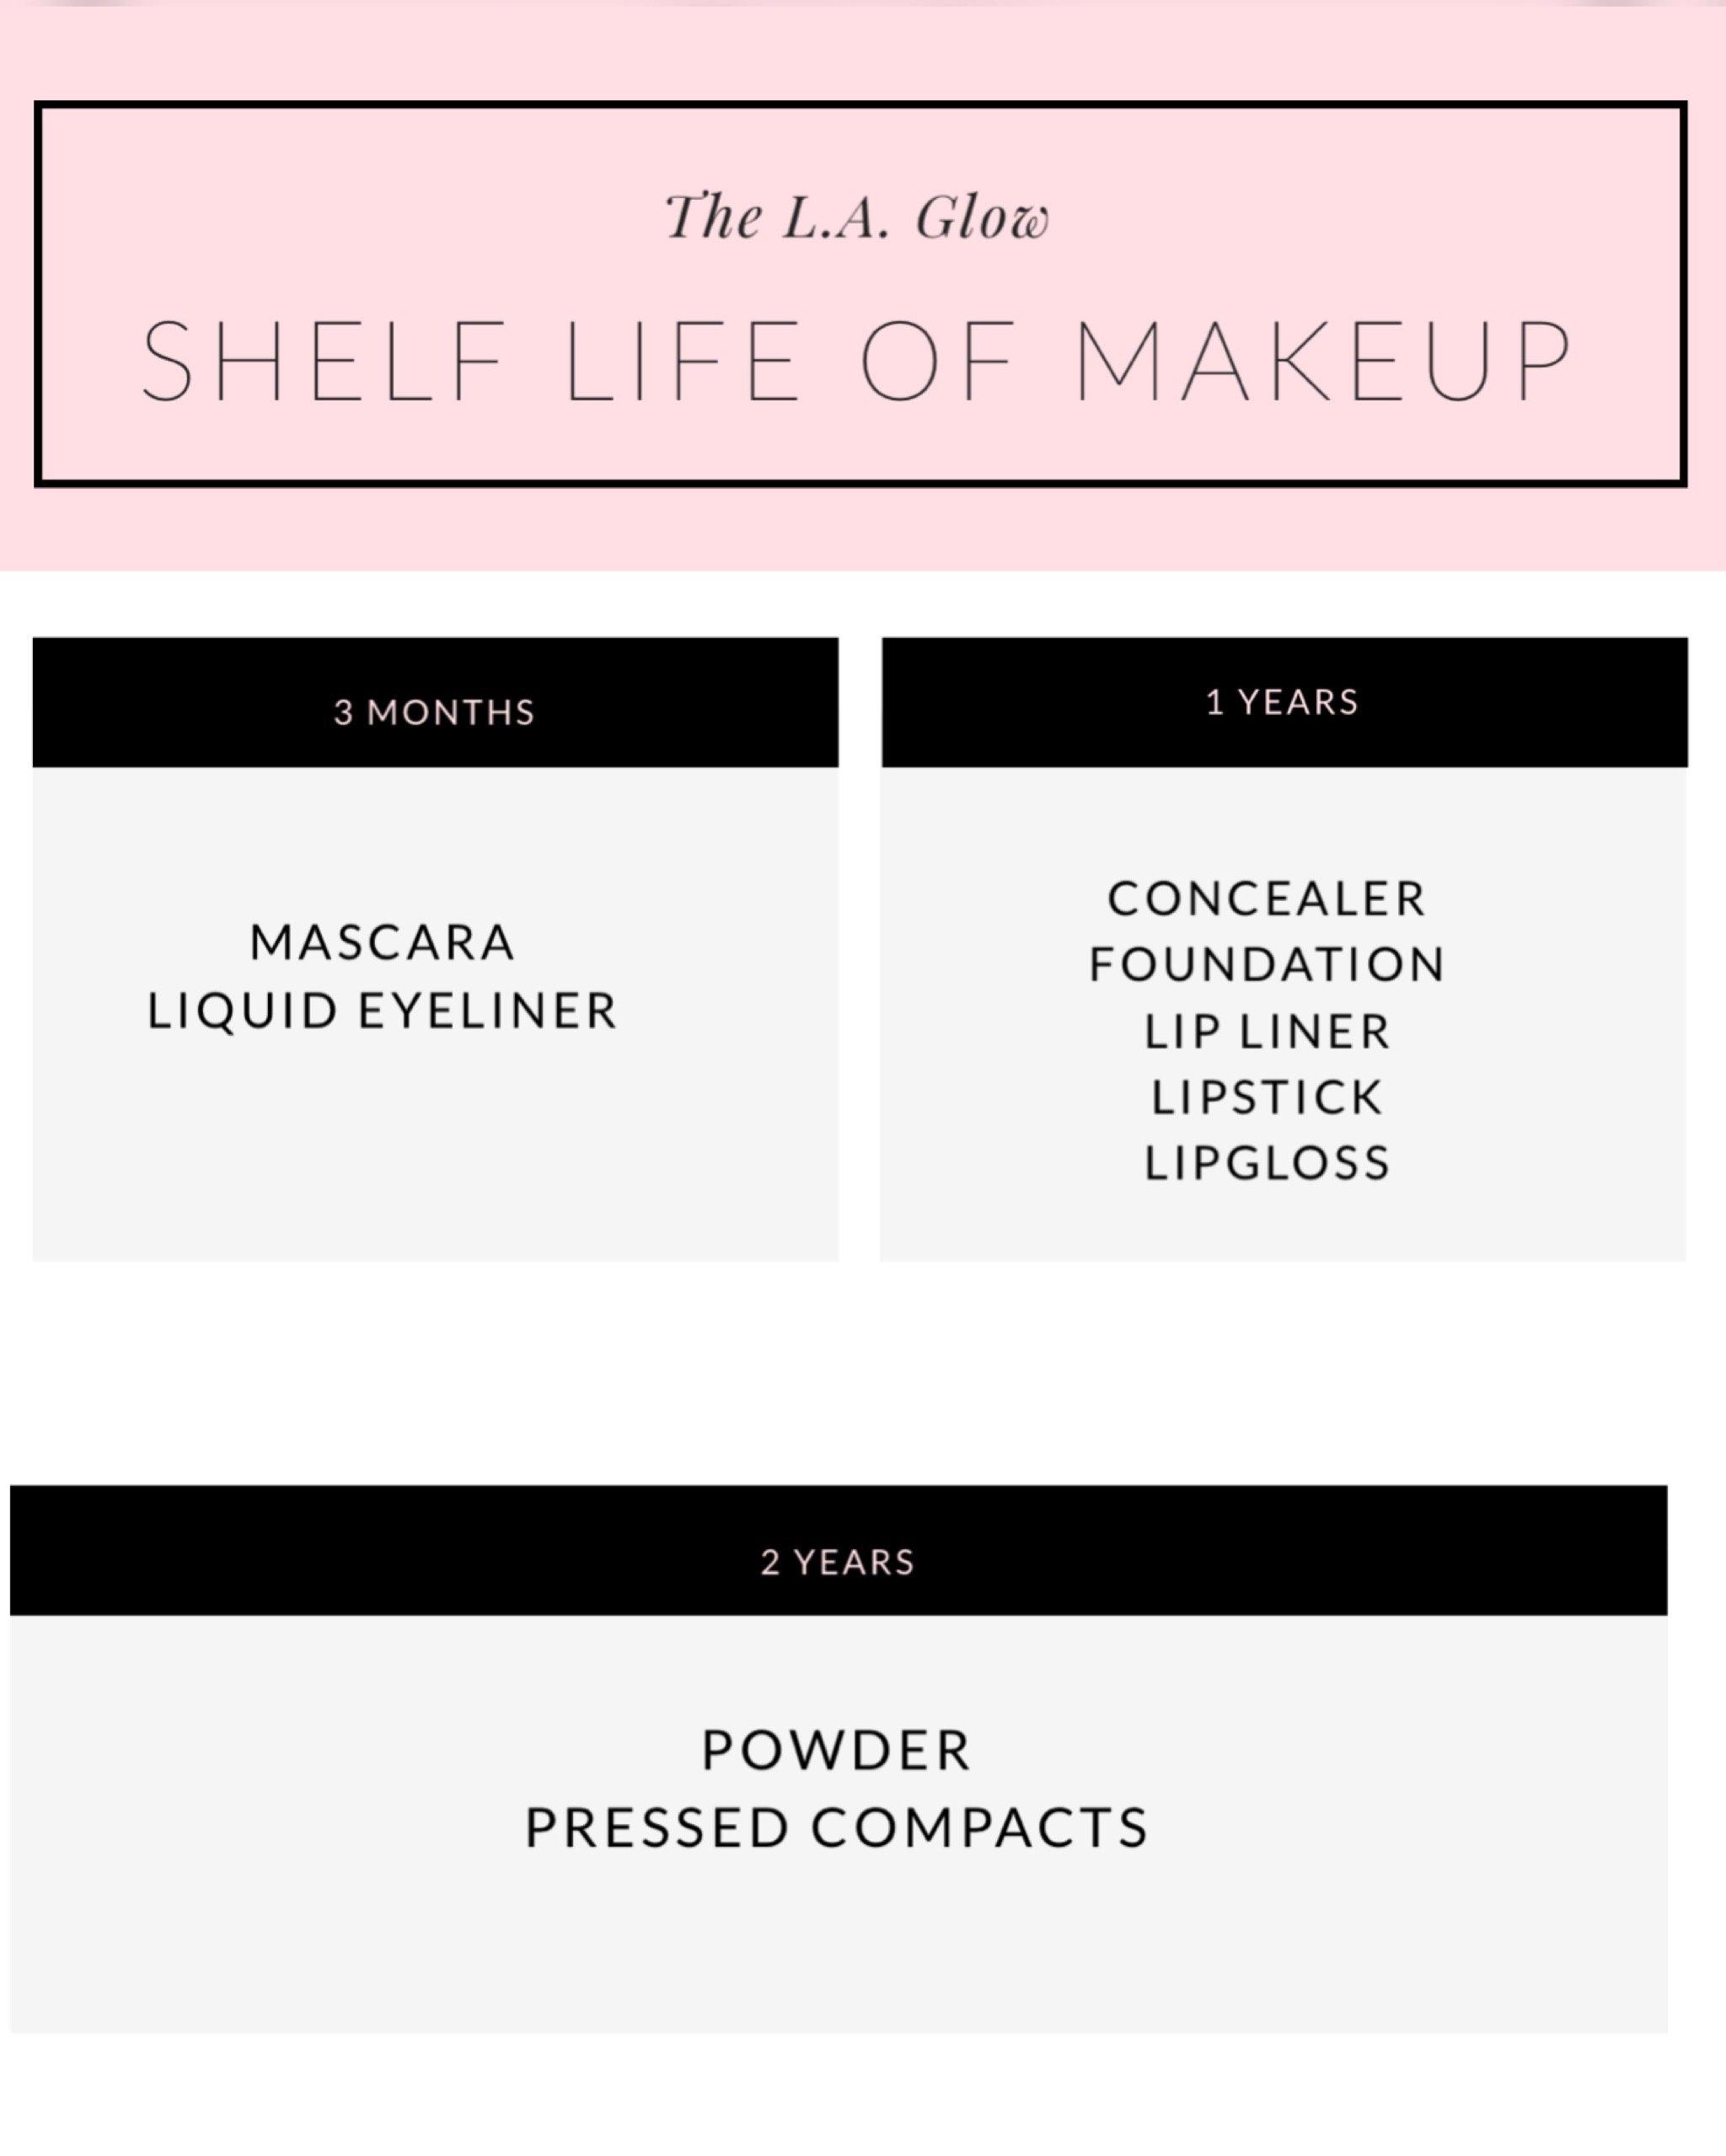 shelf life of makeup los angeles esthetician